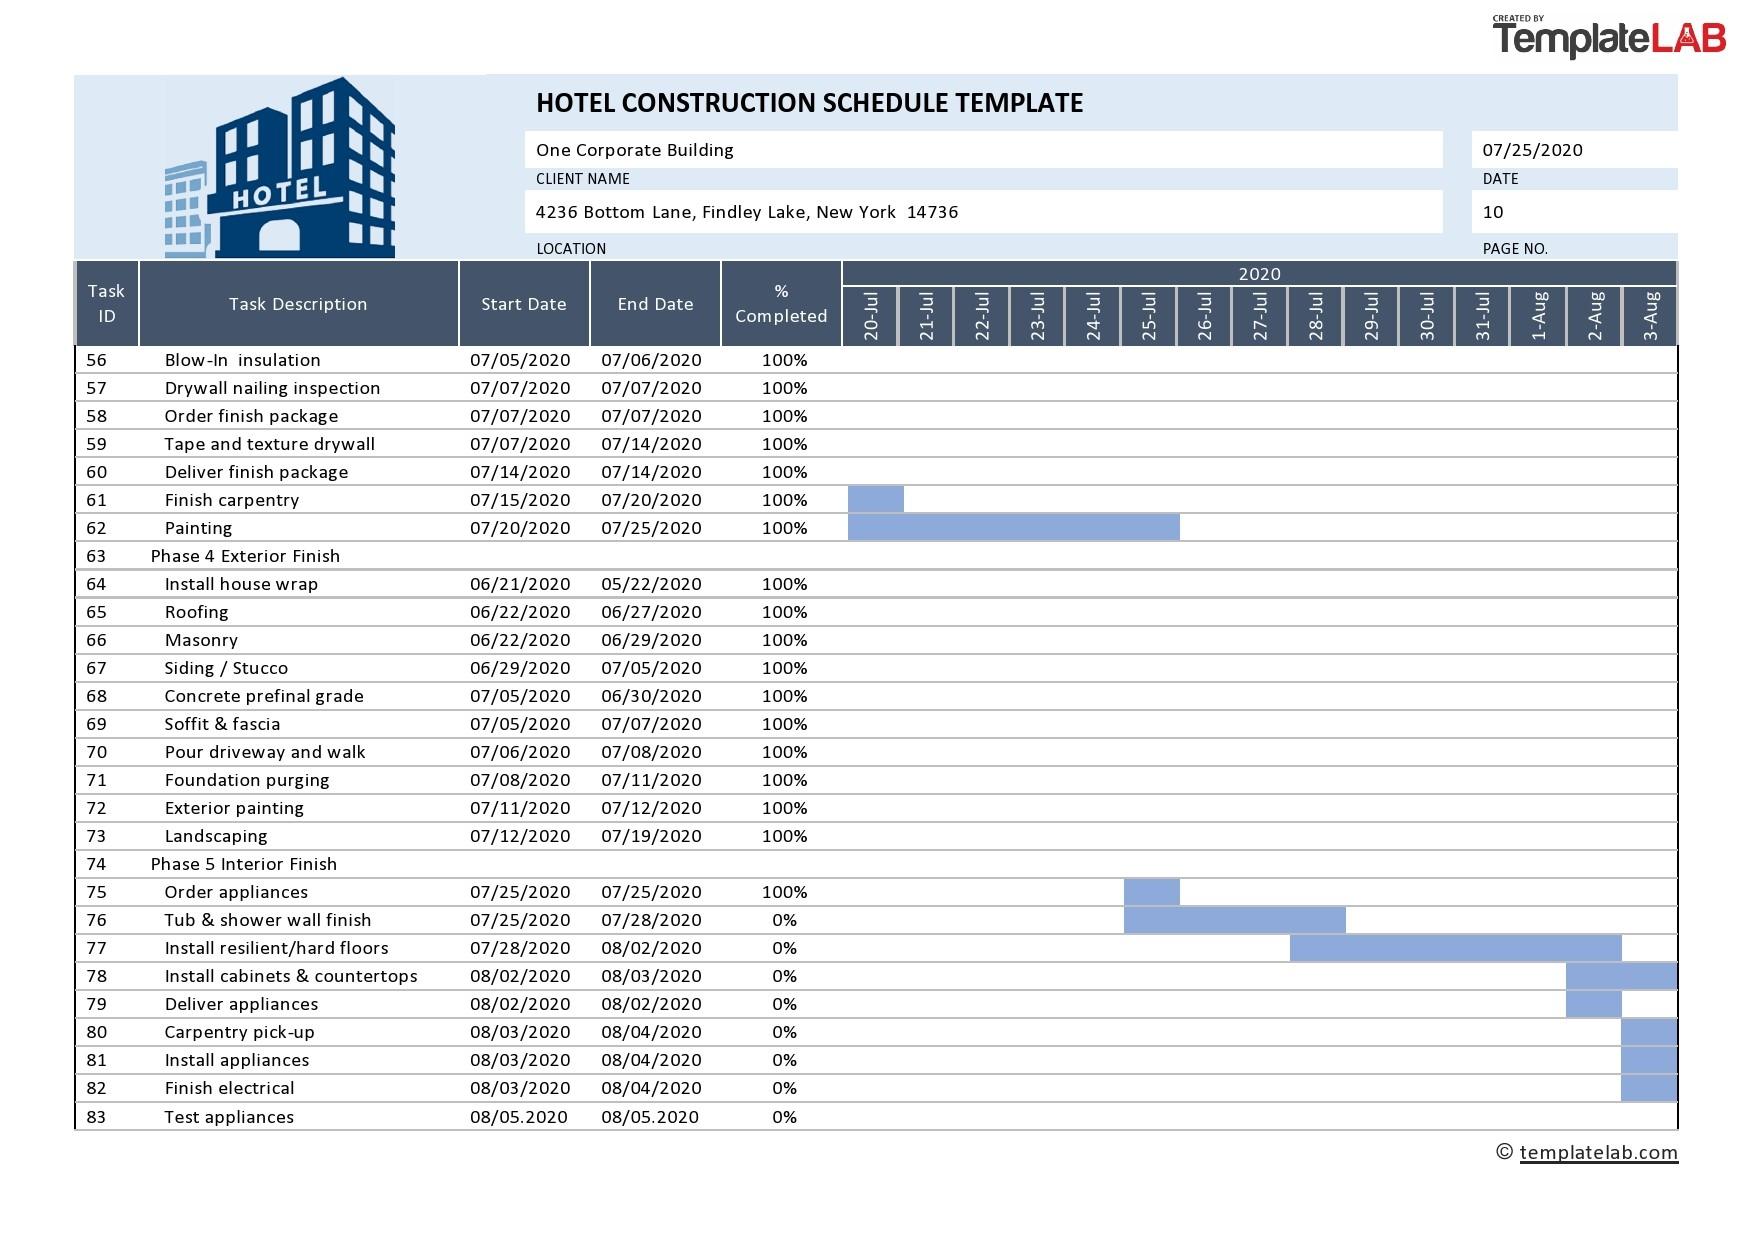 Free Hotel Construction Schedule - TemplateLab